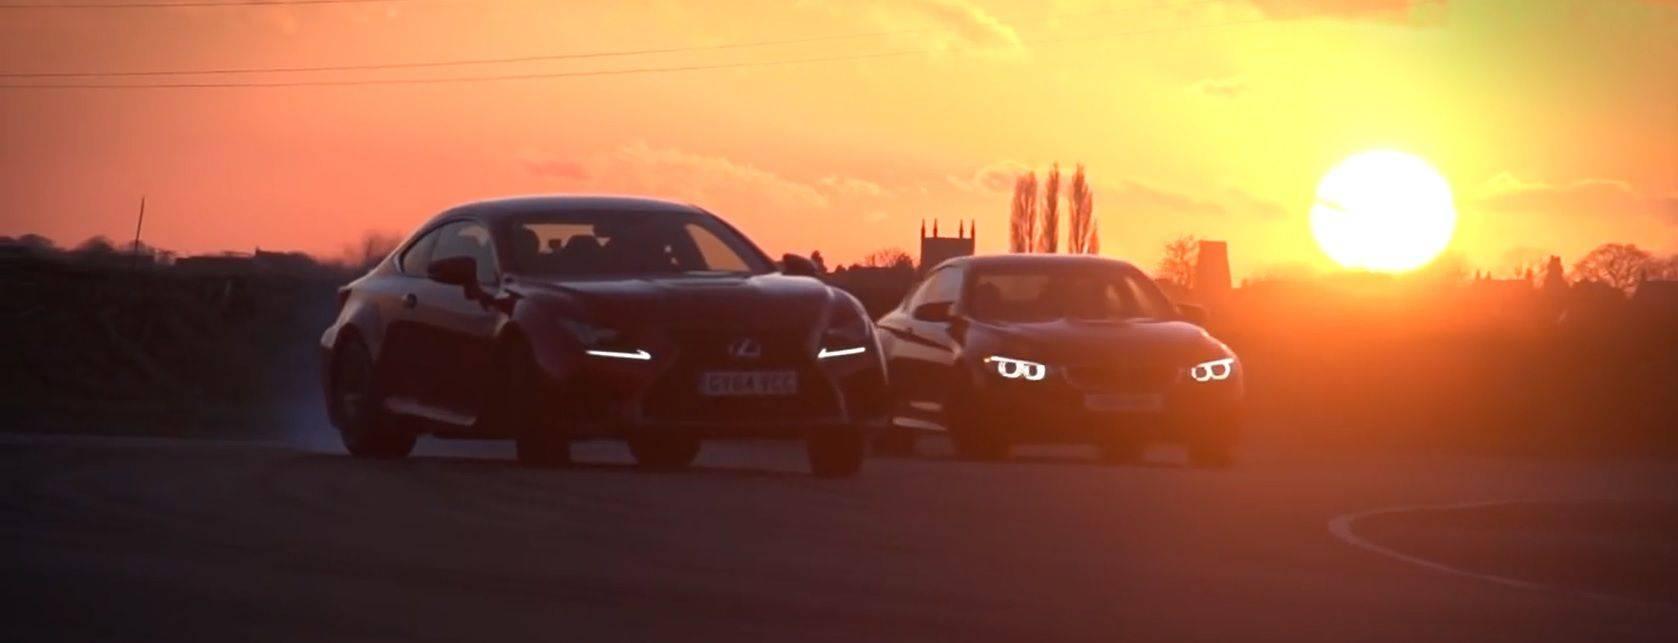 German Inline 6 Vs Japanese V8 Gt Speed